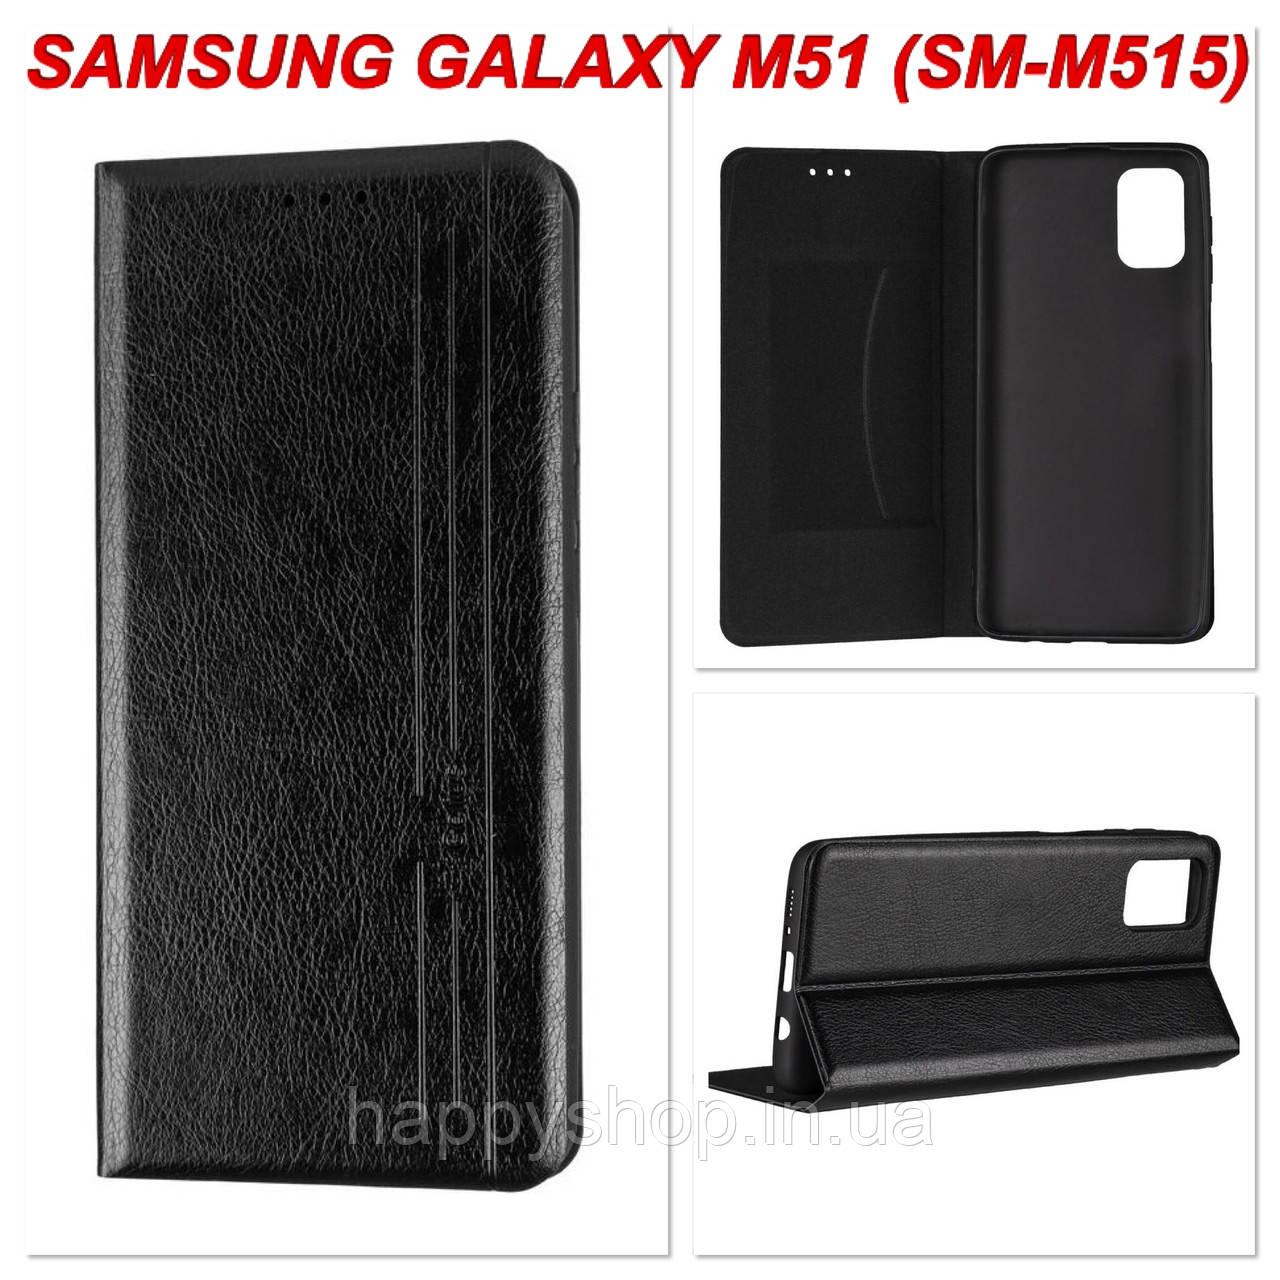 Чохол-книжка Gelius Leather New для Samsung Galaxy M51 (SM-M515) Чорний